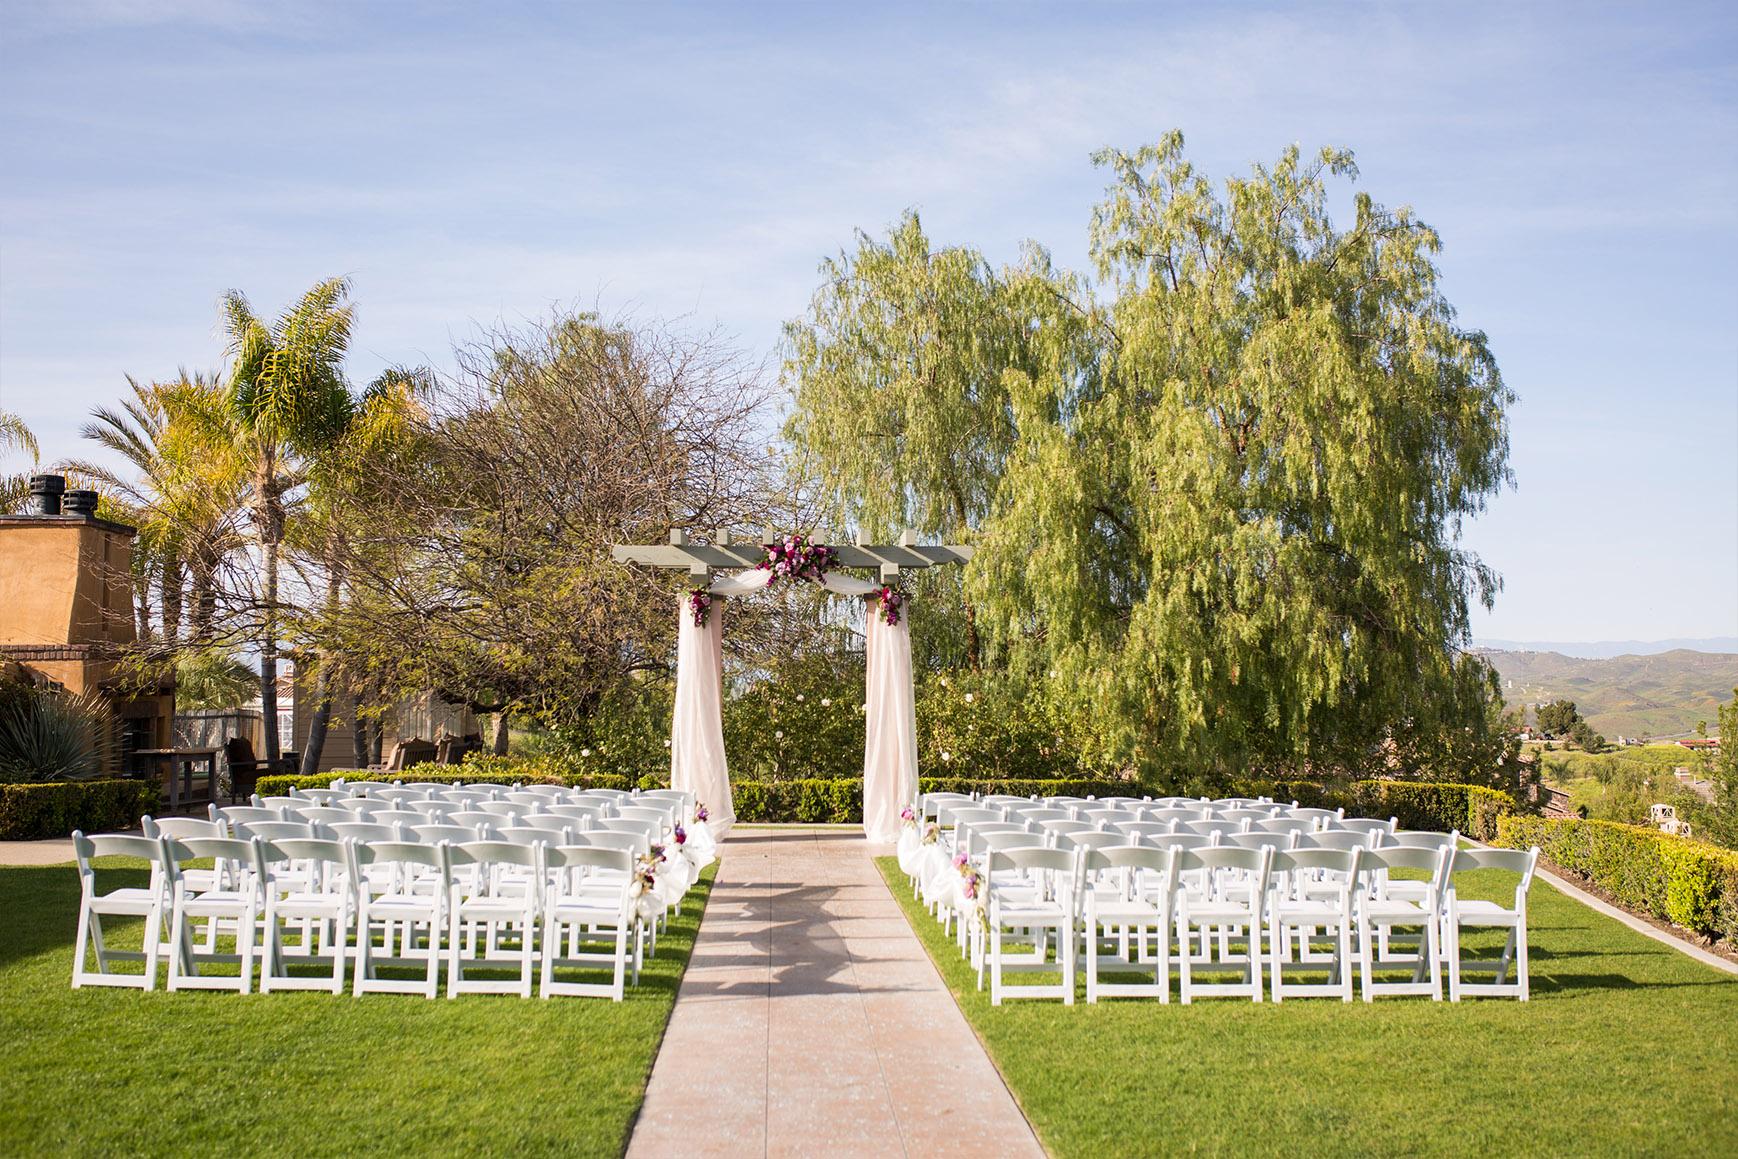 Romantic ceremony setup - The Retreat - Corona, California - Riverside County - Wedgewood Weddings